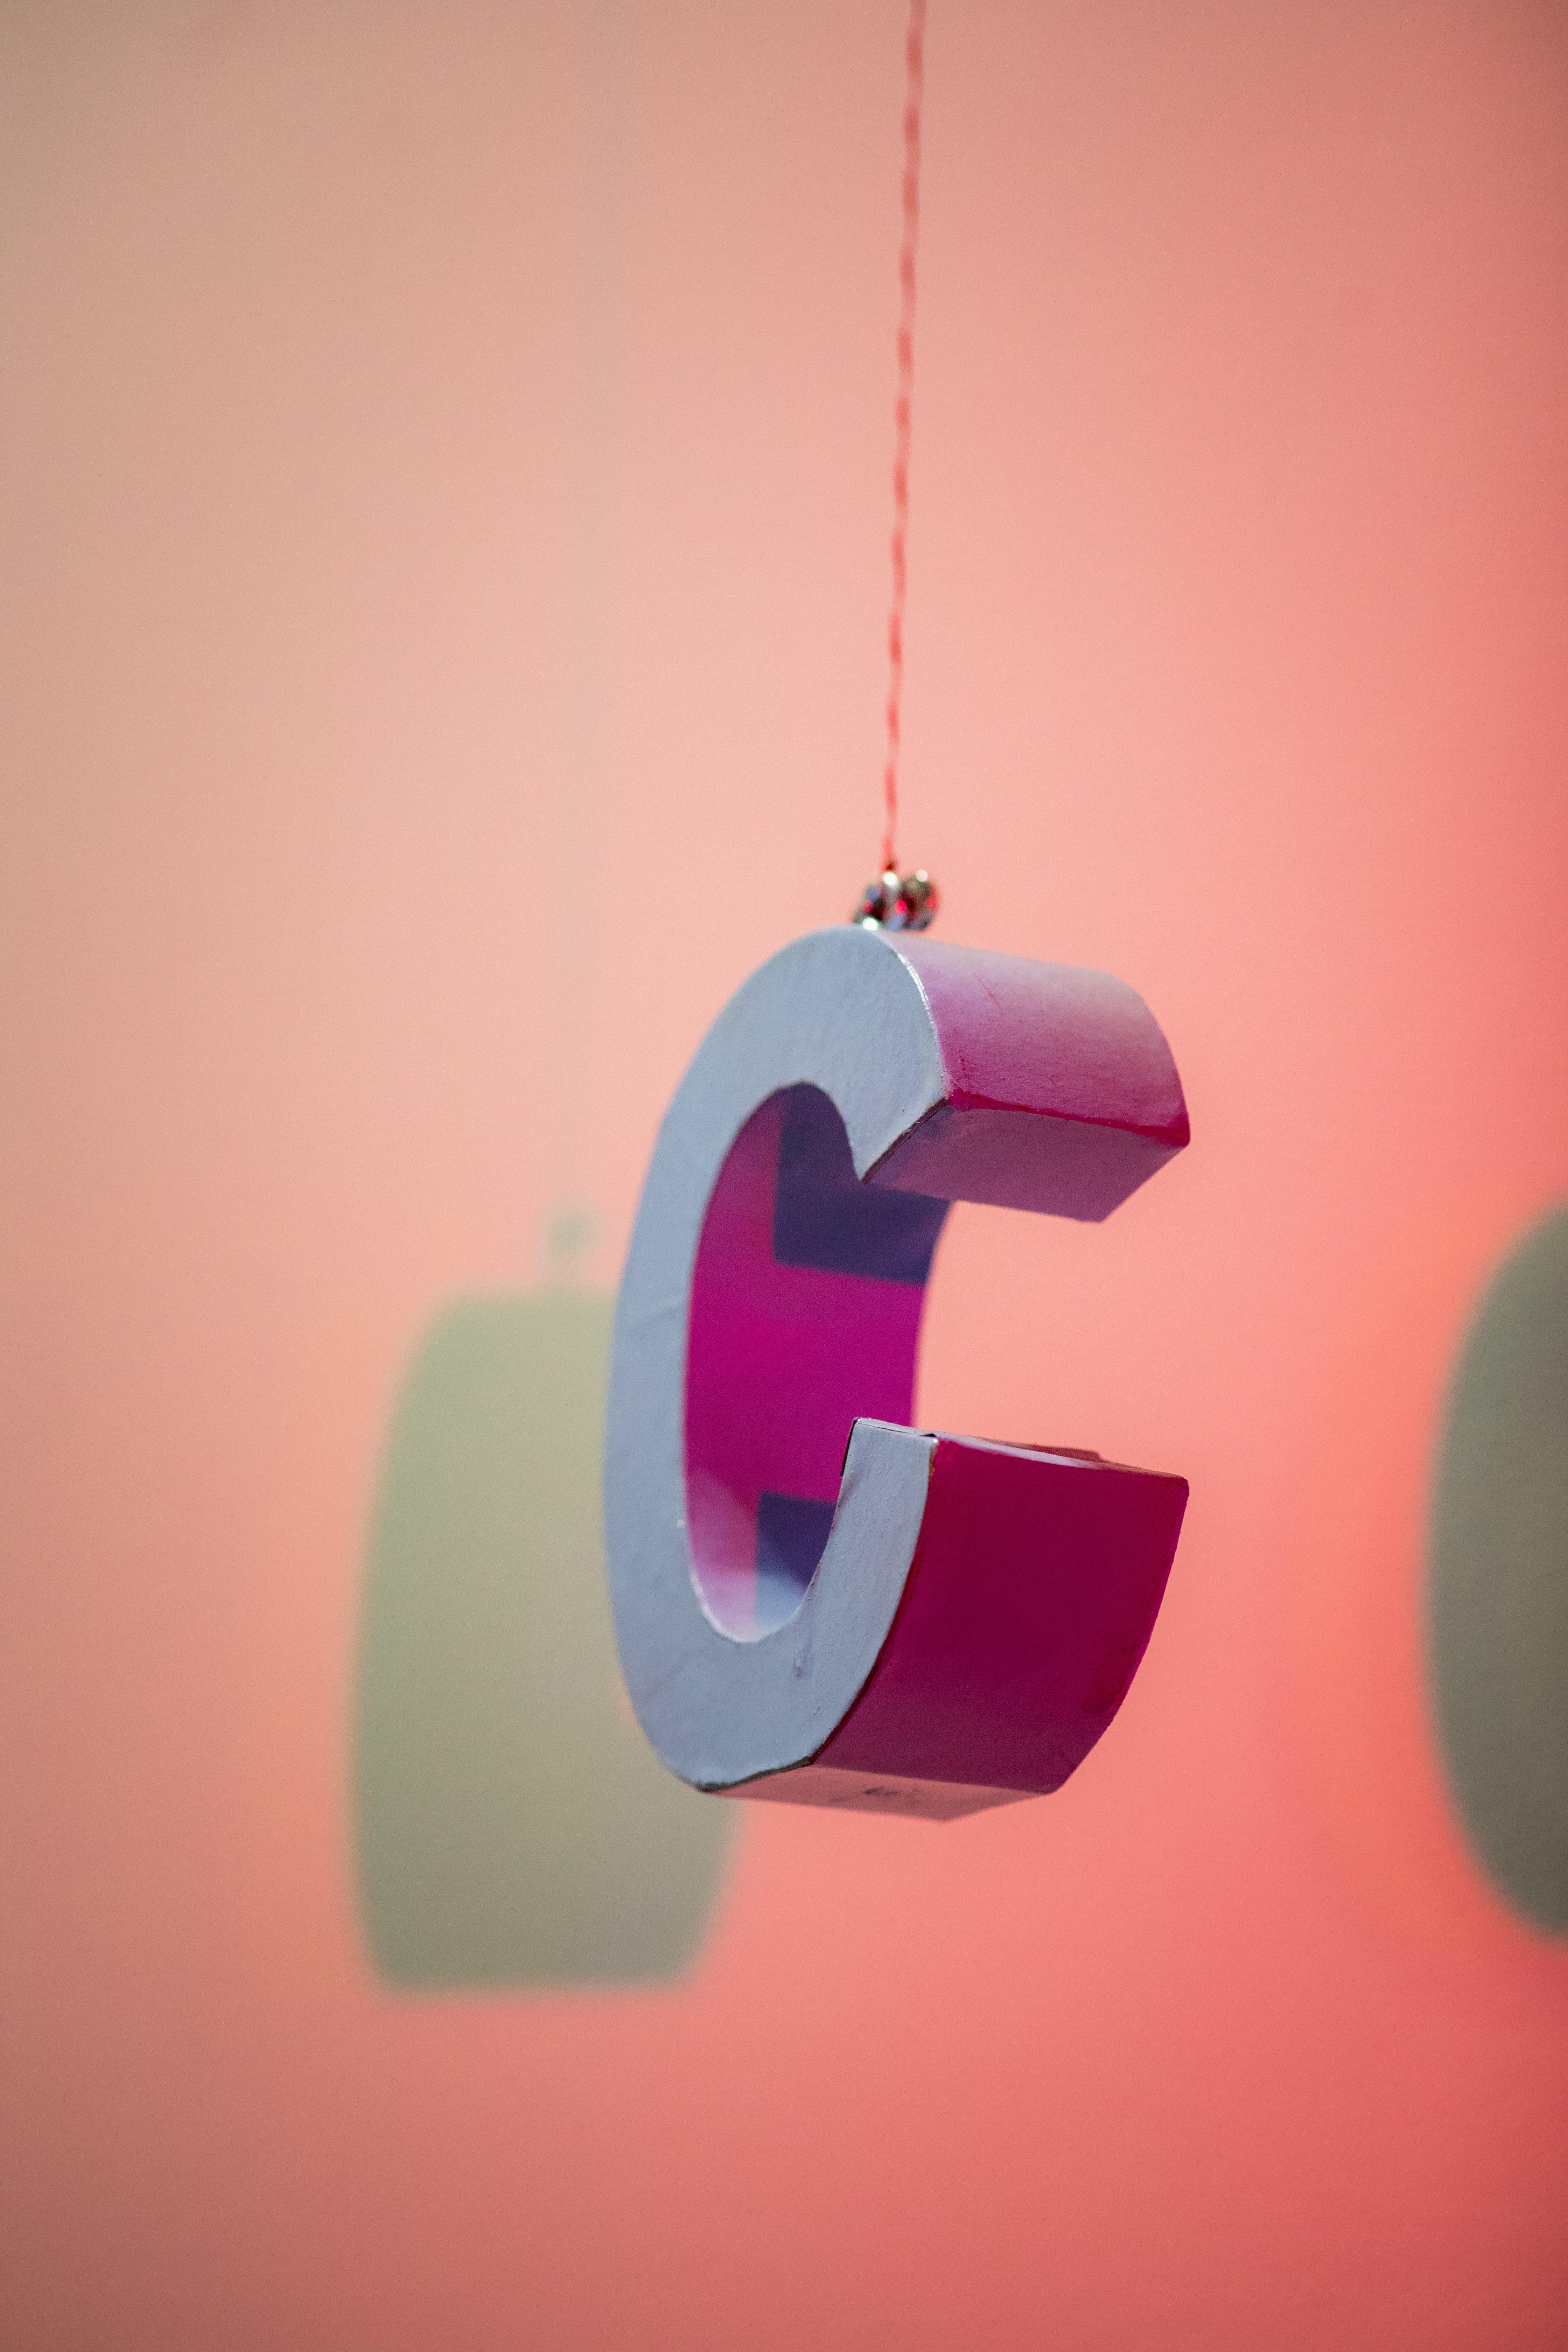 Pink logo of company